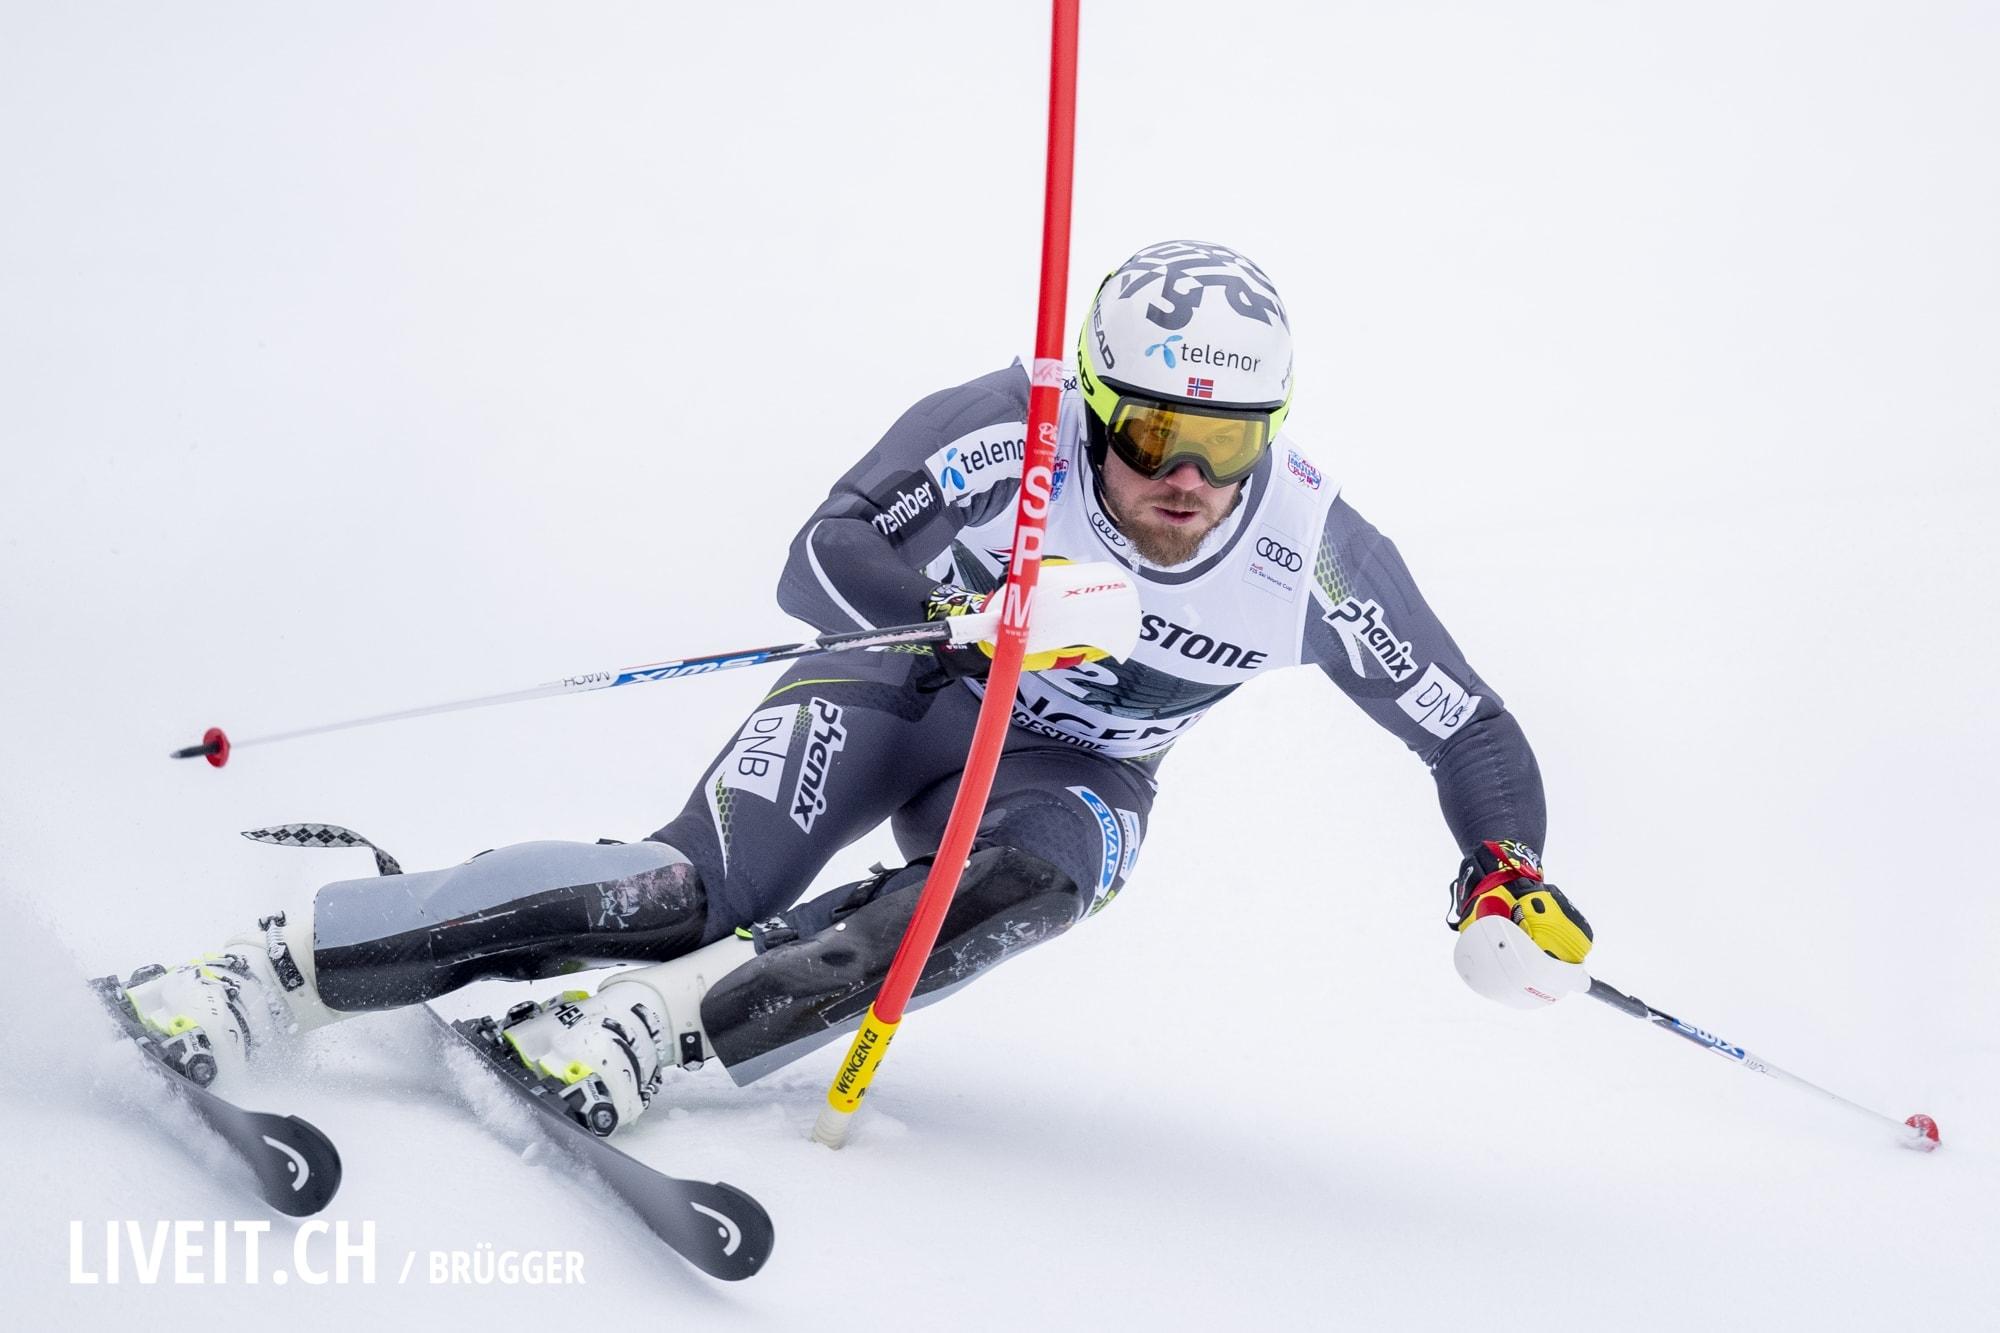 Kjetil Jansrud (NOR) fotografiert am Freitag, 18. Januar 2019 am Lauberhornrennen in der Disziplin: Slalom Alpine Kombination. (Fotografiert von Dominic Bruegger liveit.ch)